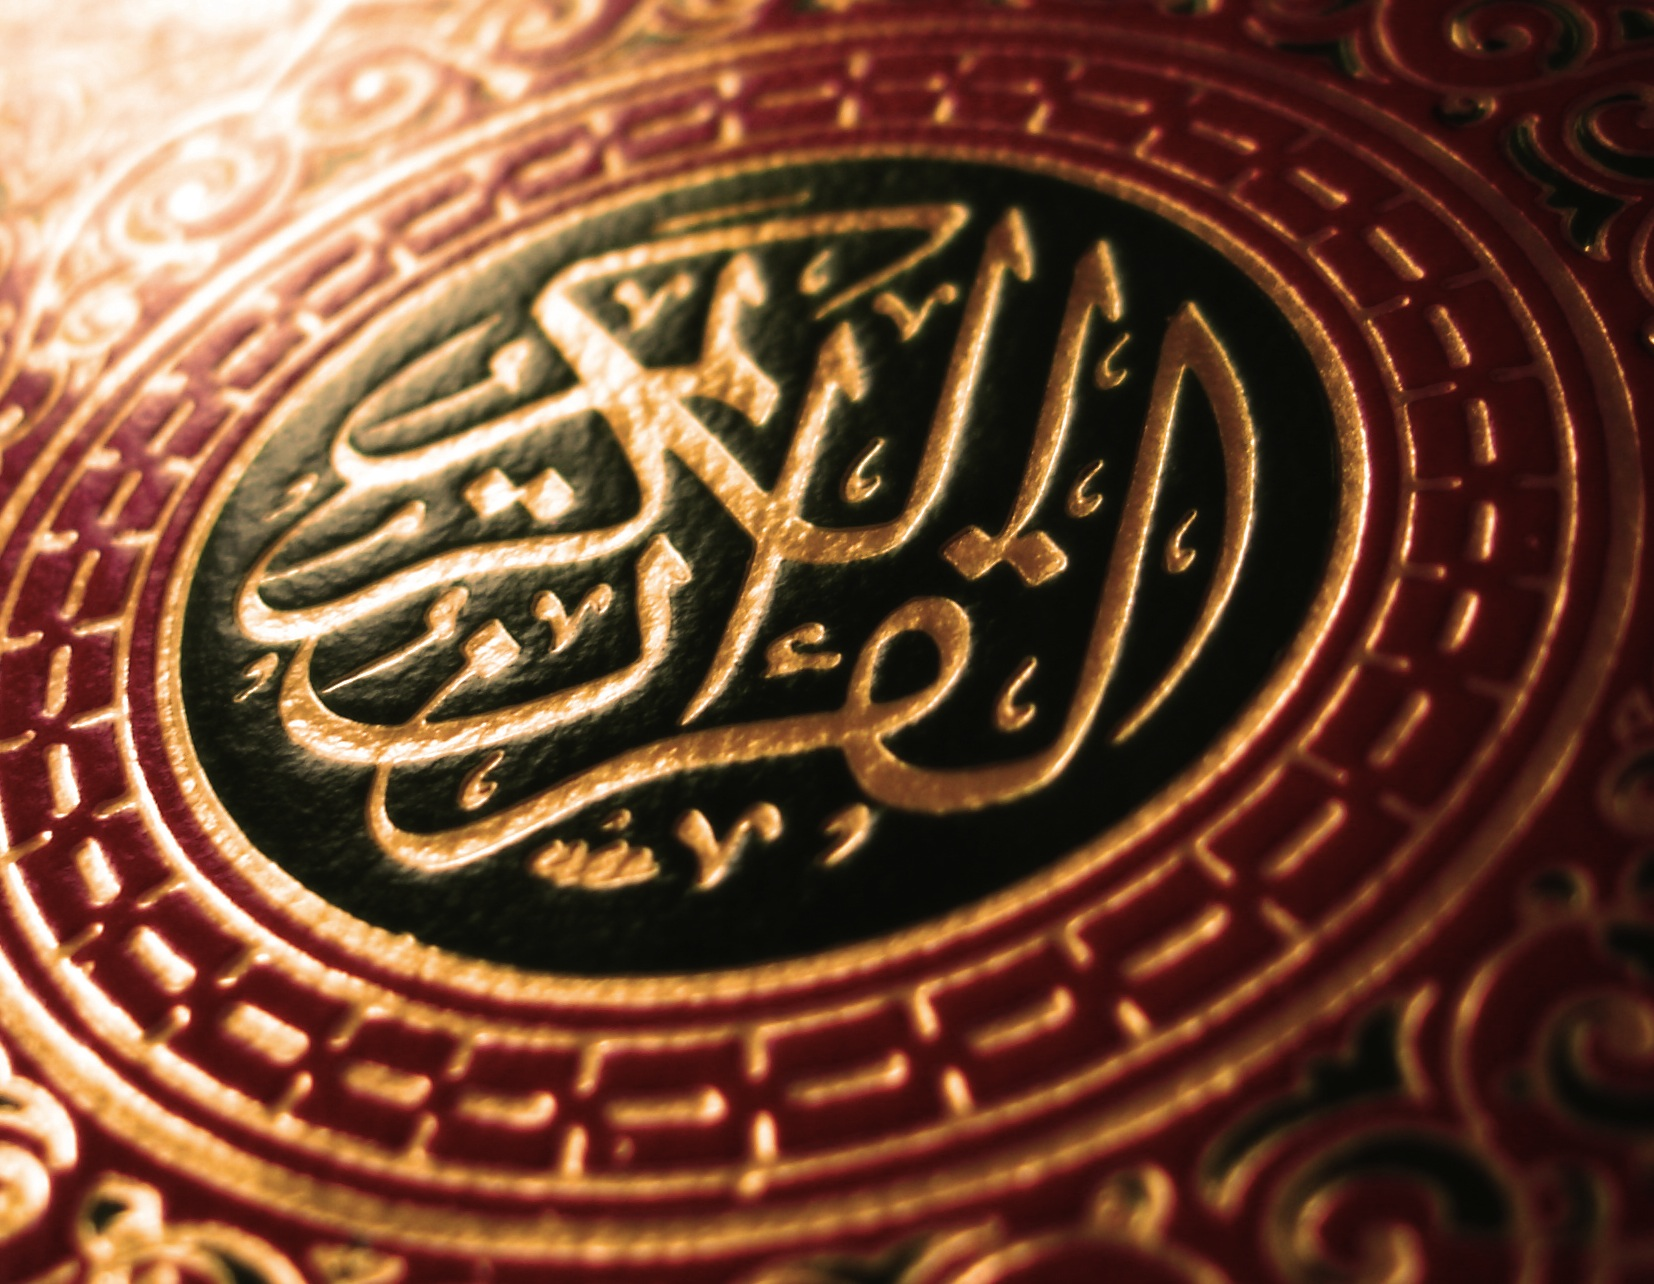 Islamisten berufen sich auf den Koran. Foto: crystalina/Wikimedia Commons (CC-BY-2.0)